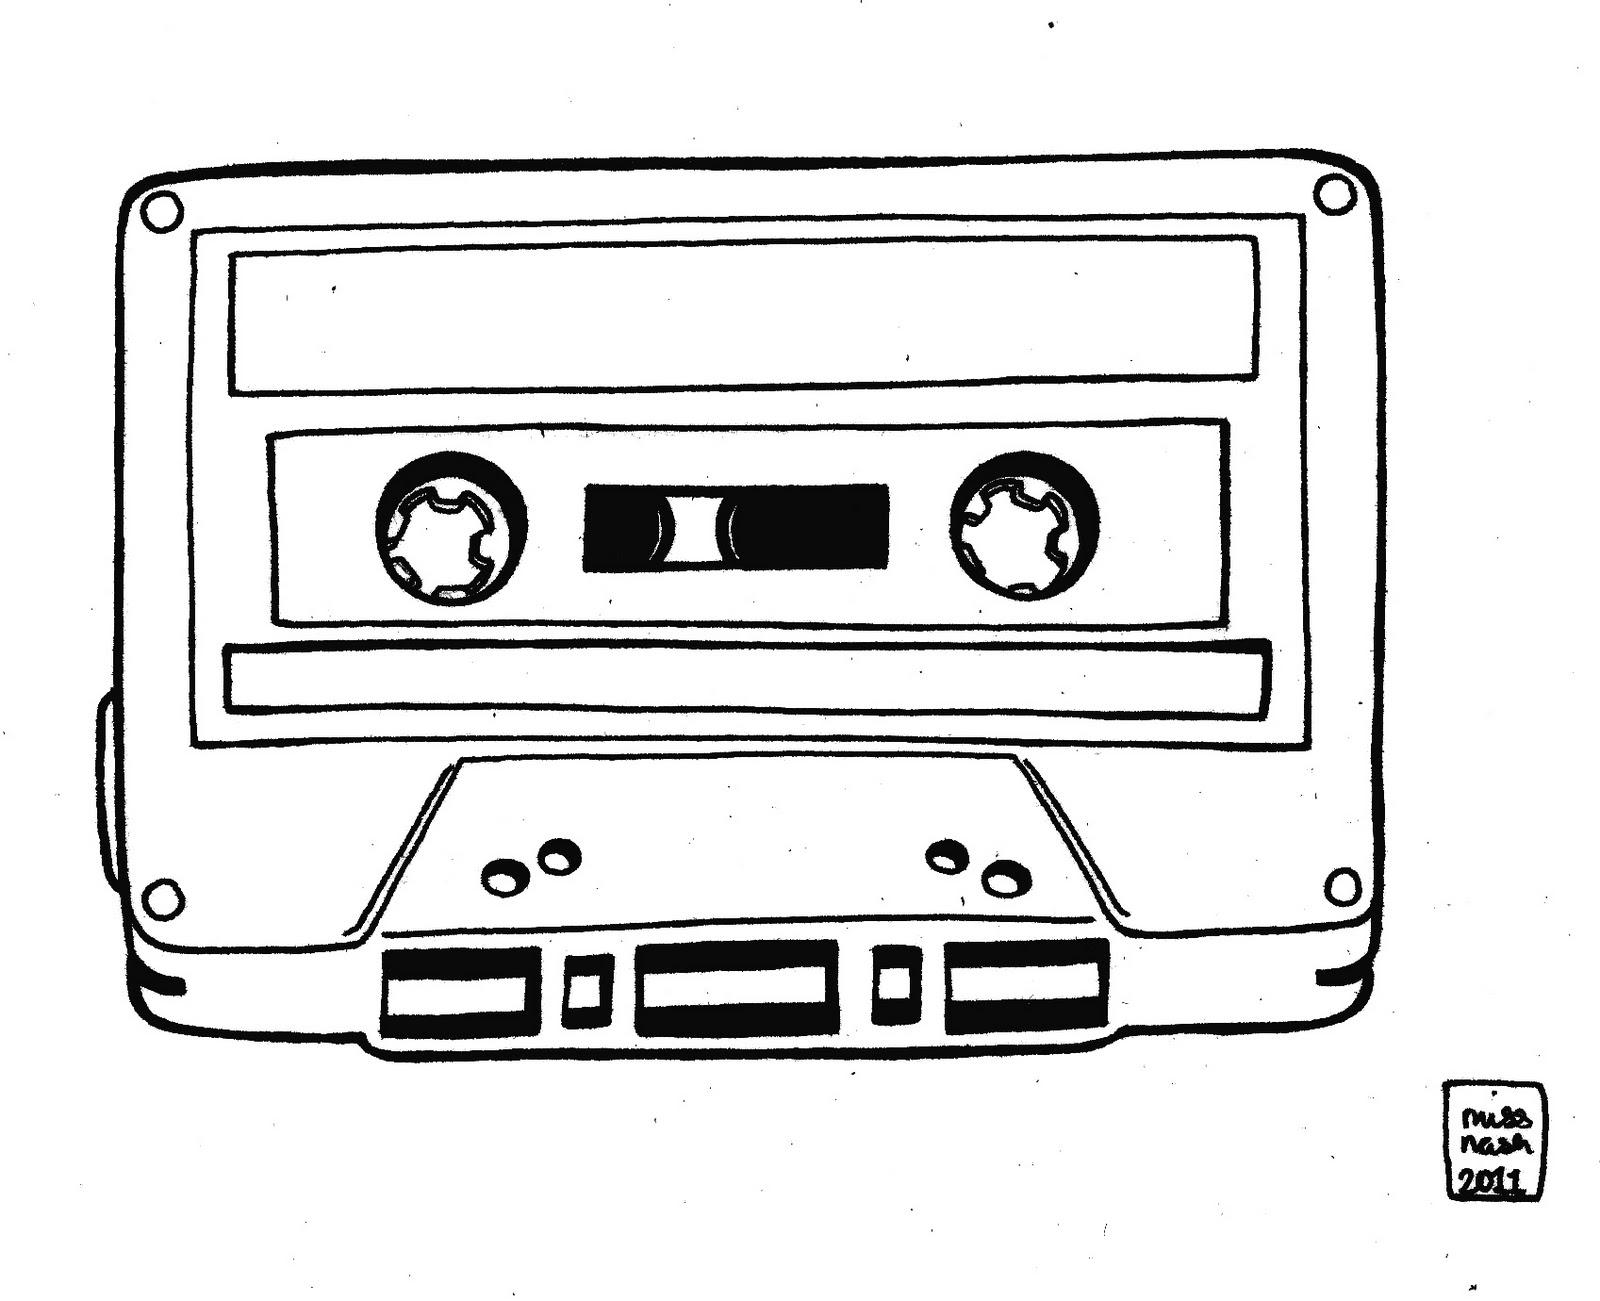 Cassette Drawing Tumblr | www.pixshark.com - Images ...